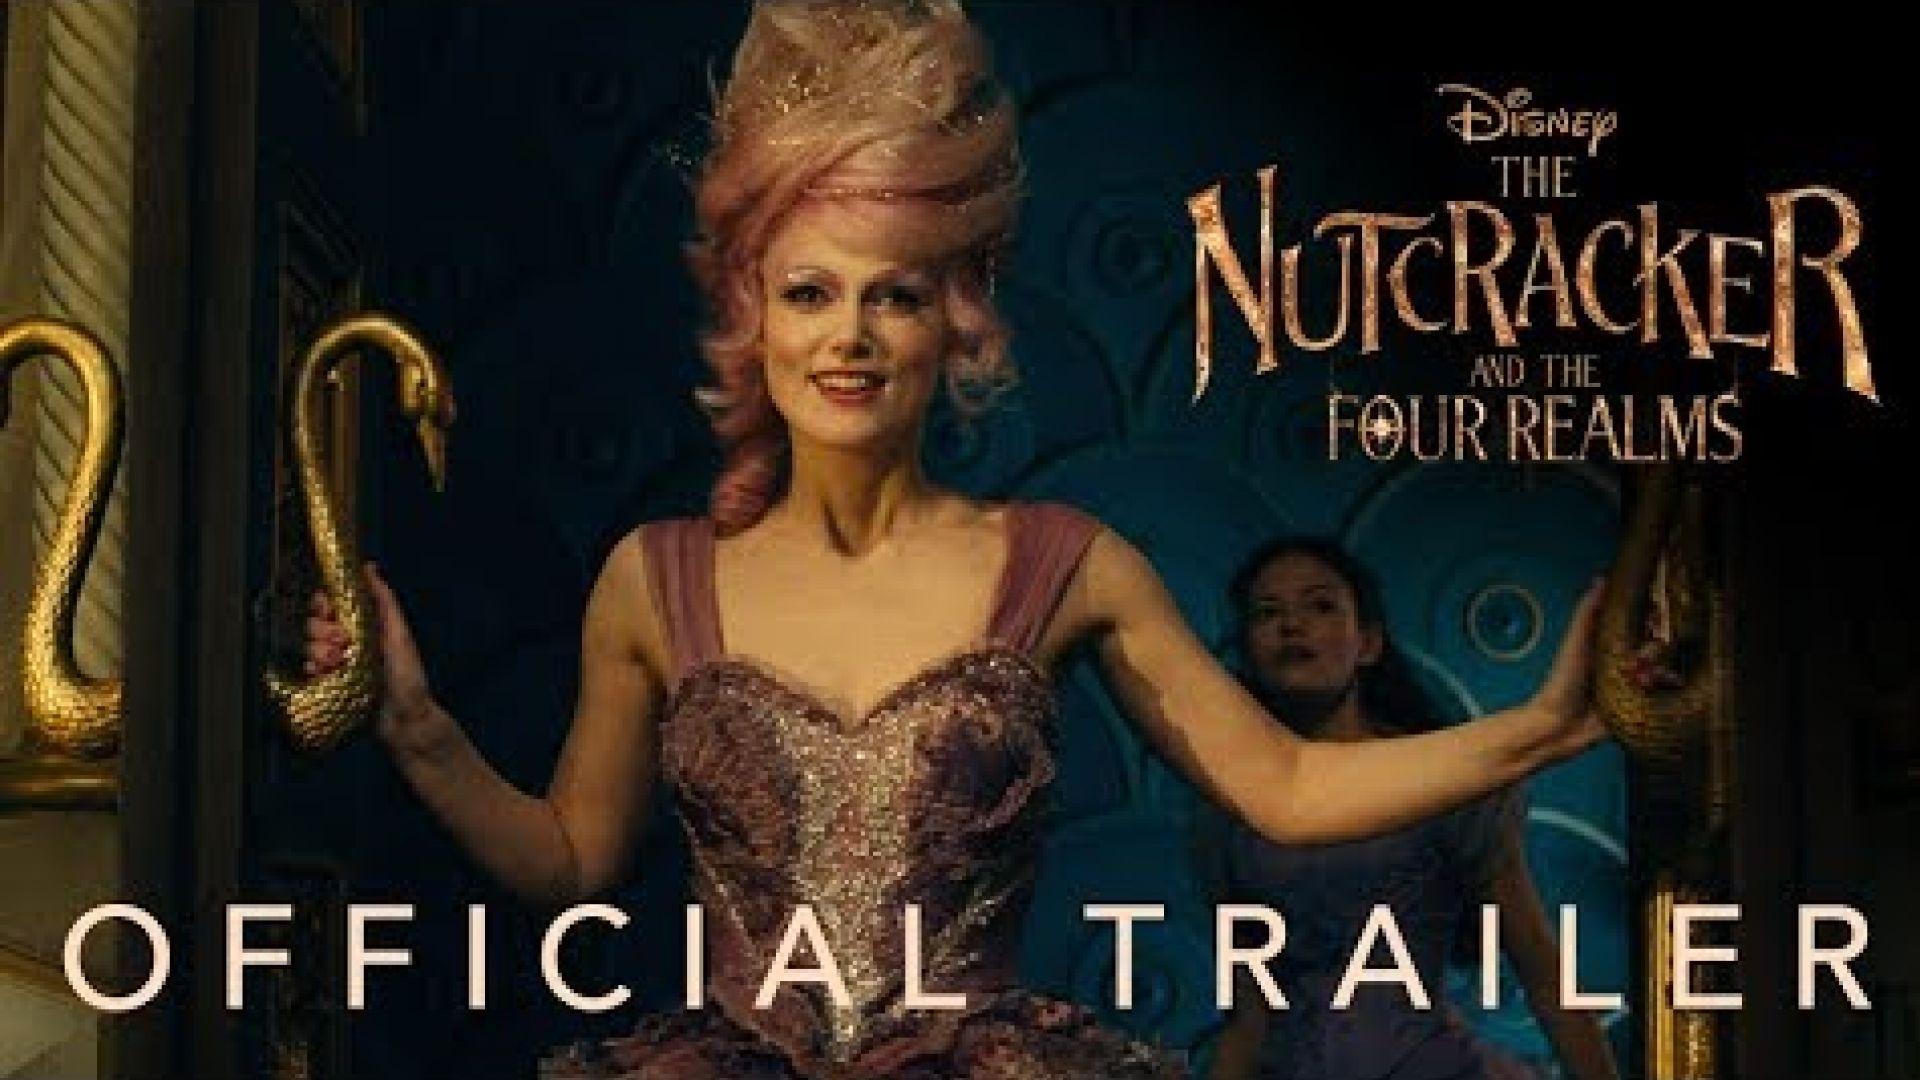 Disney's The Nutcracker And The Four Realms Teaser Trailer